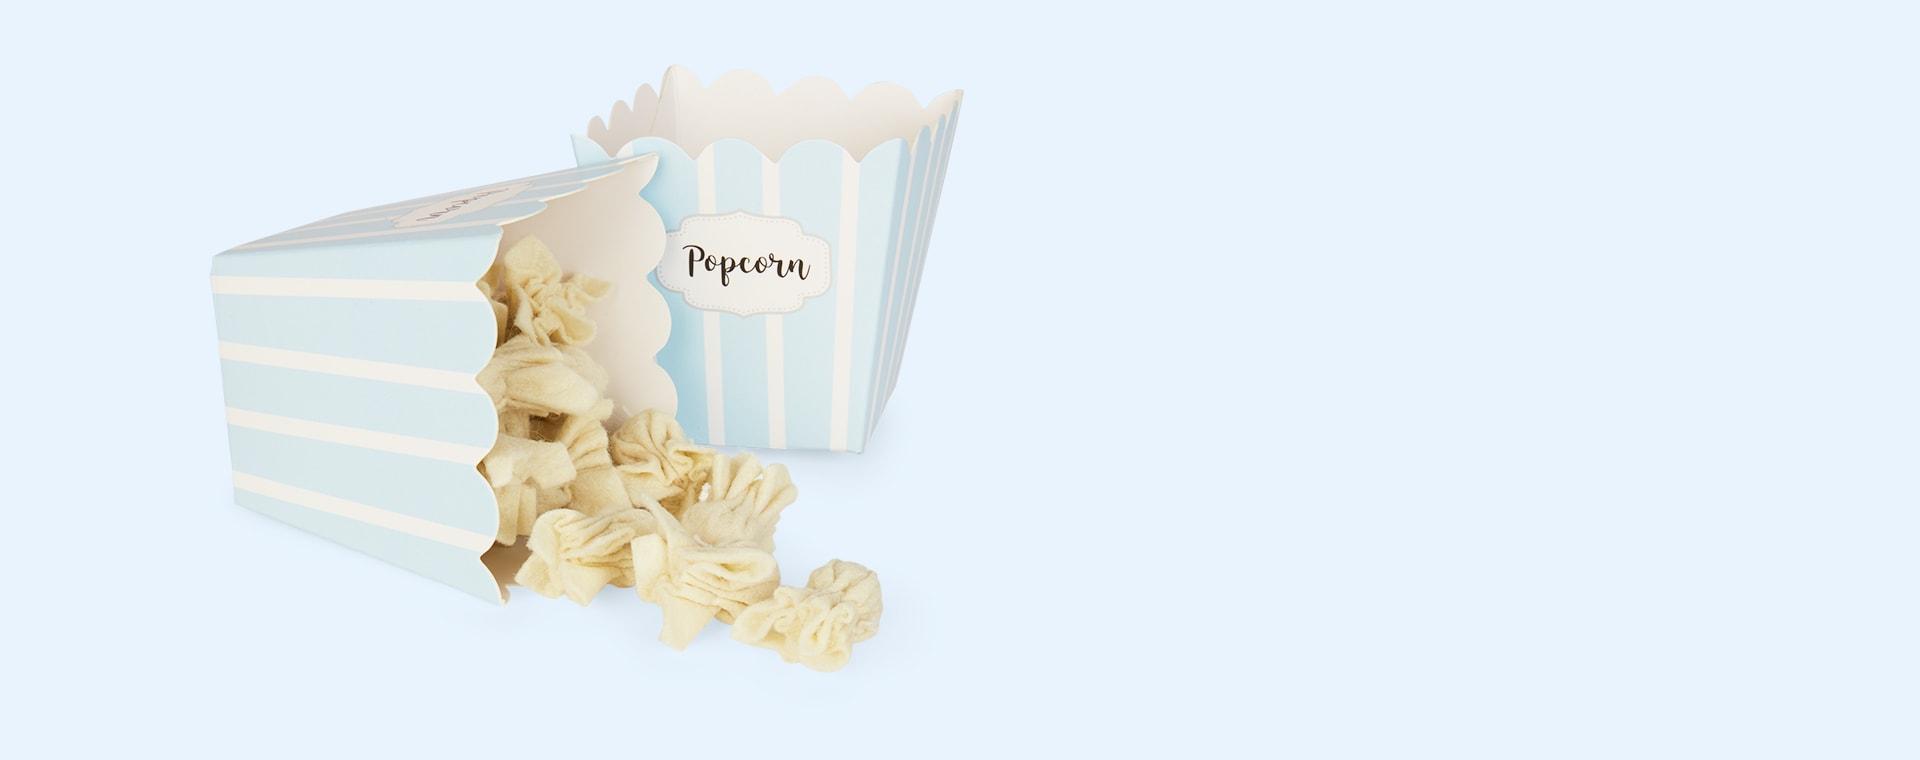 Grey Jabadabado Popcorn Trolley